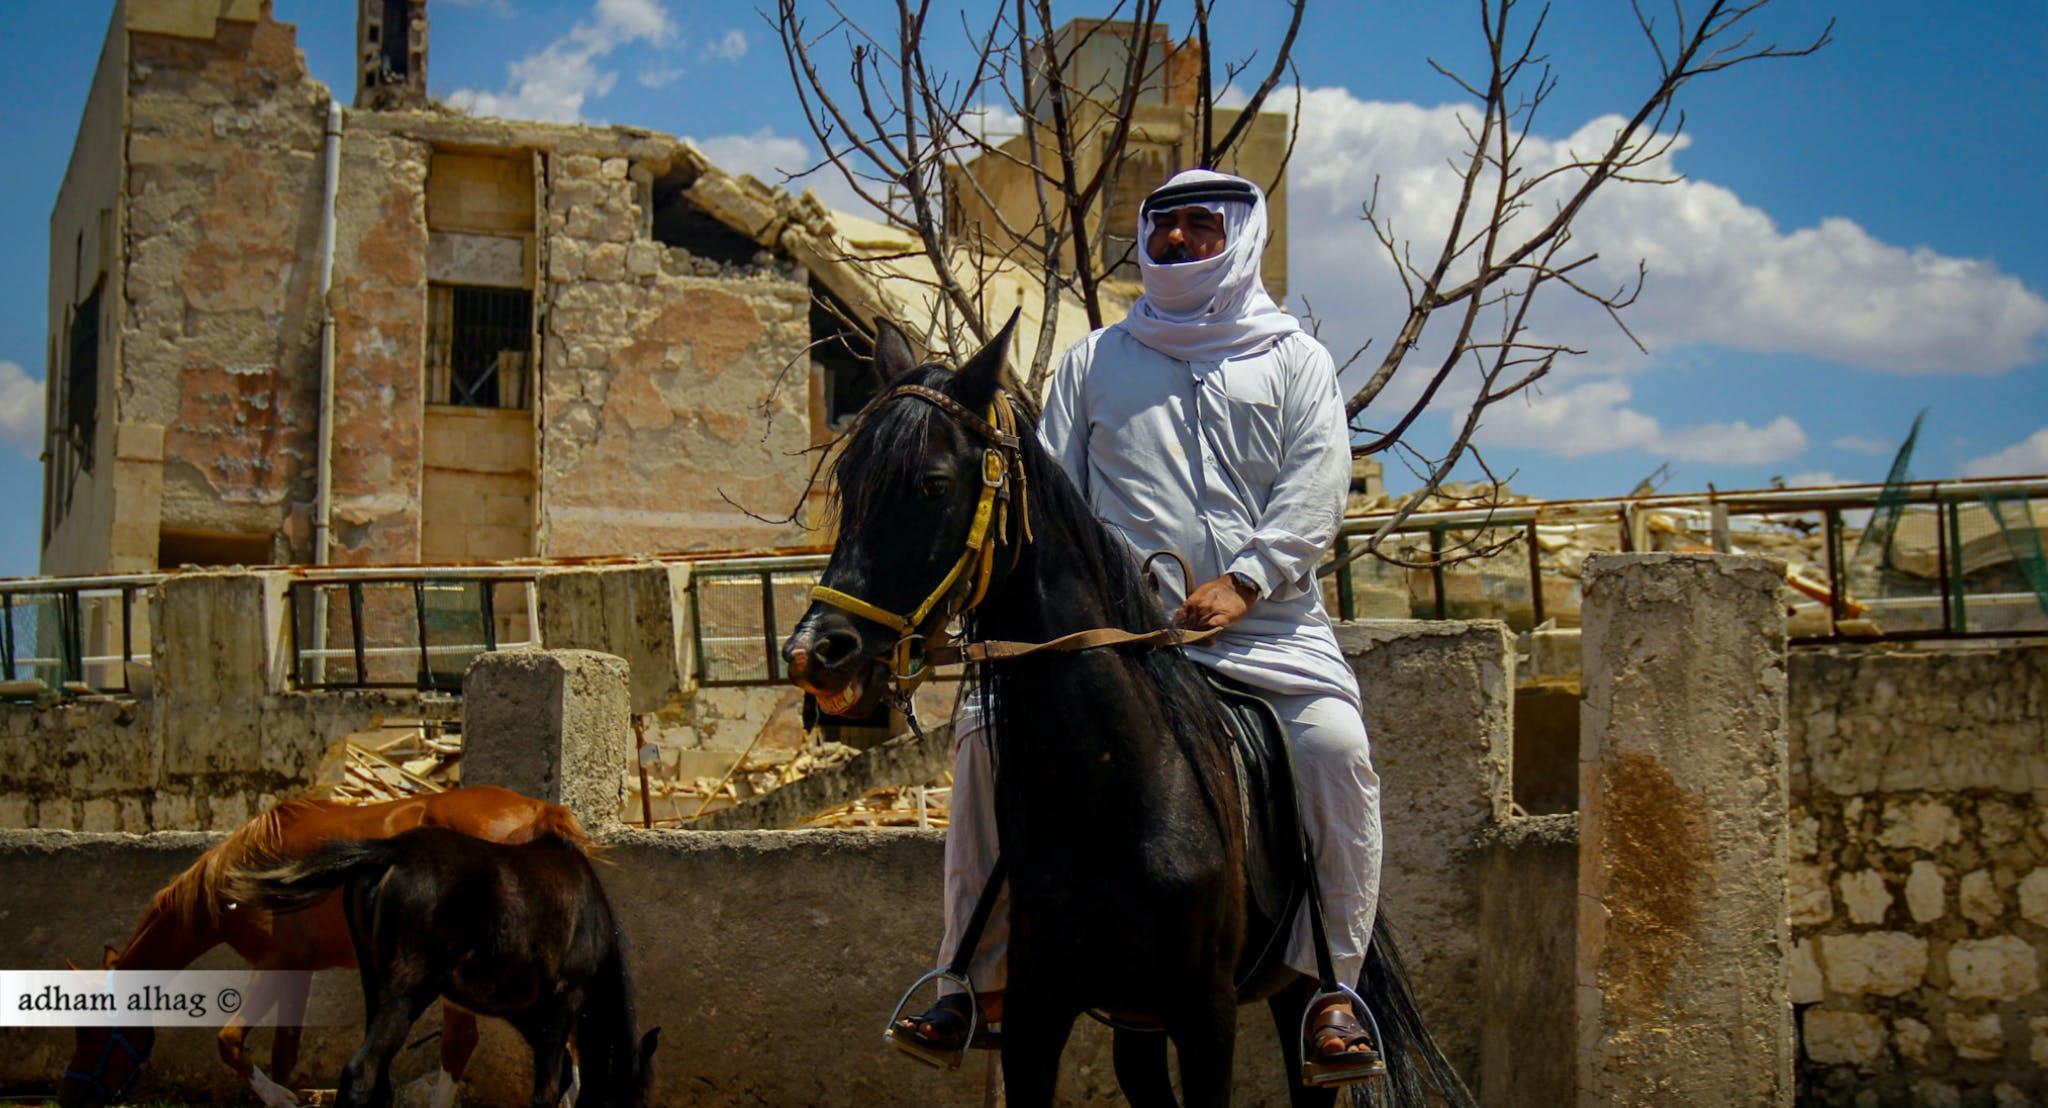 canon, esel, syrien